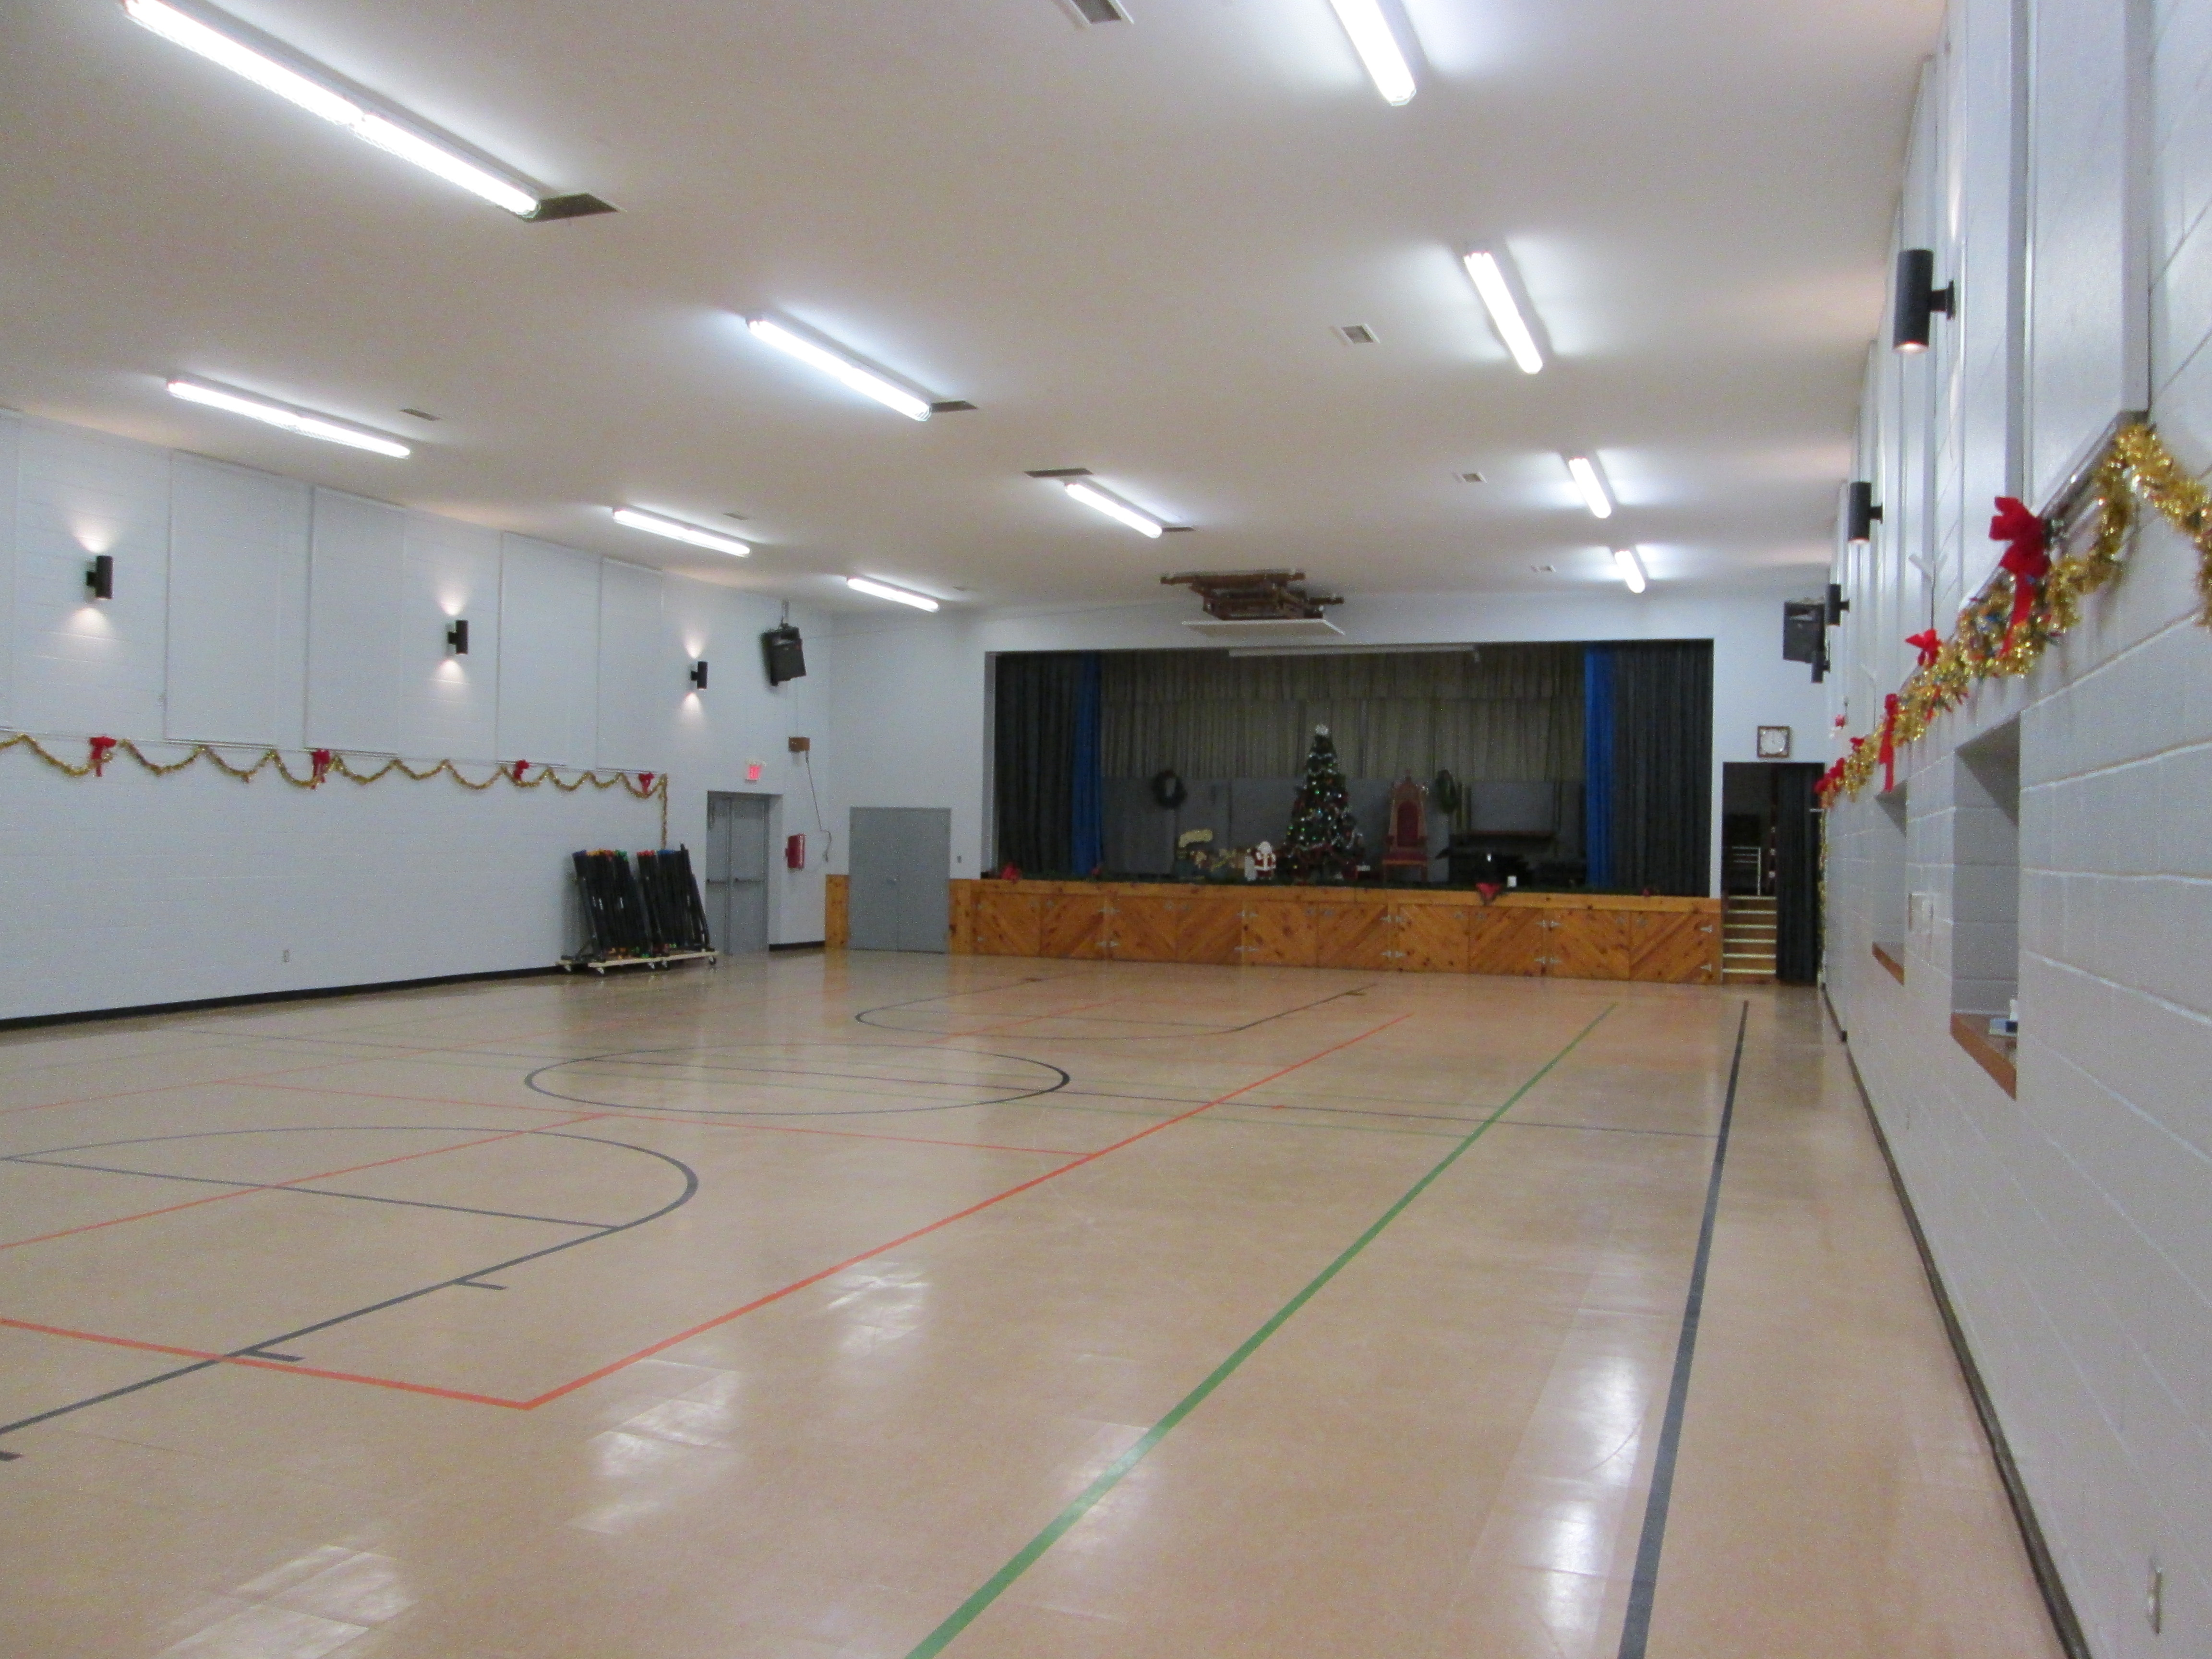 KCC Gymnasium Stage View